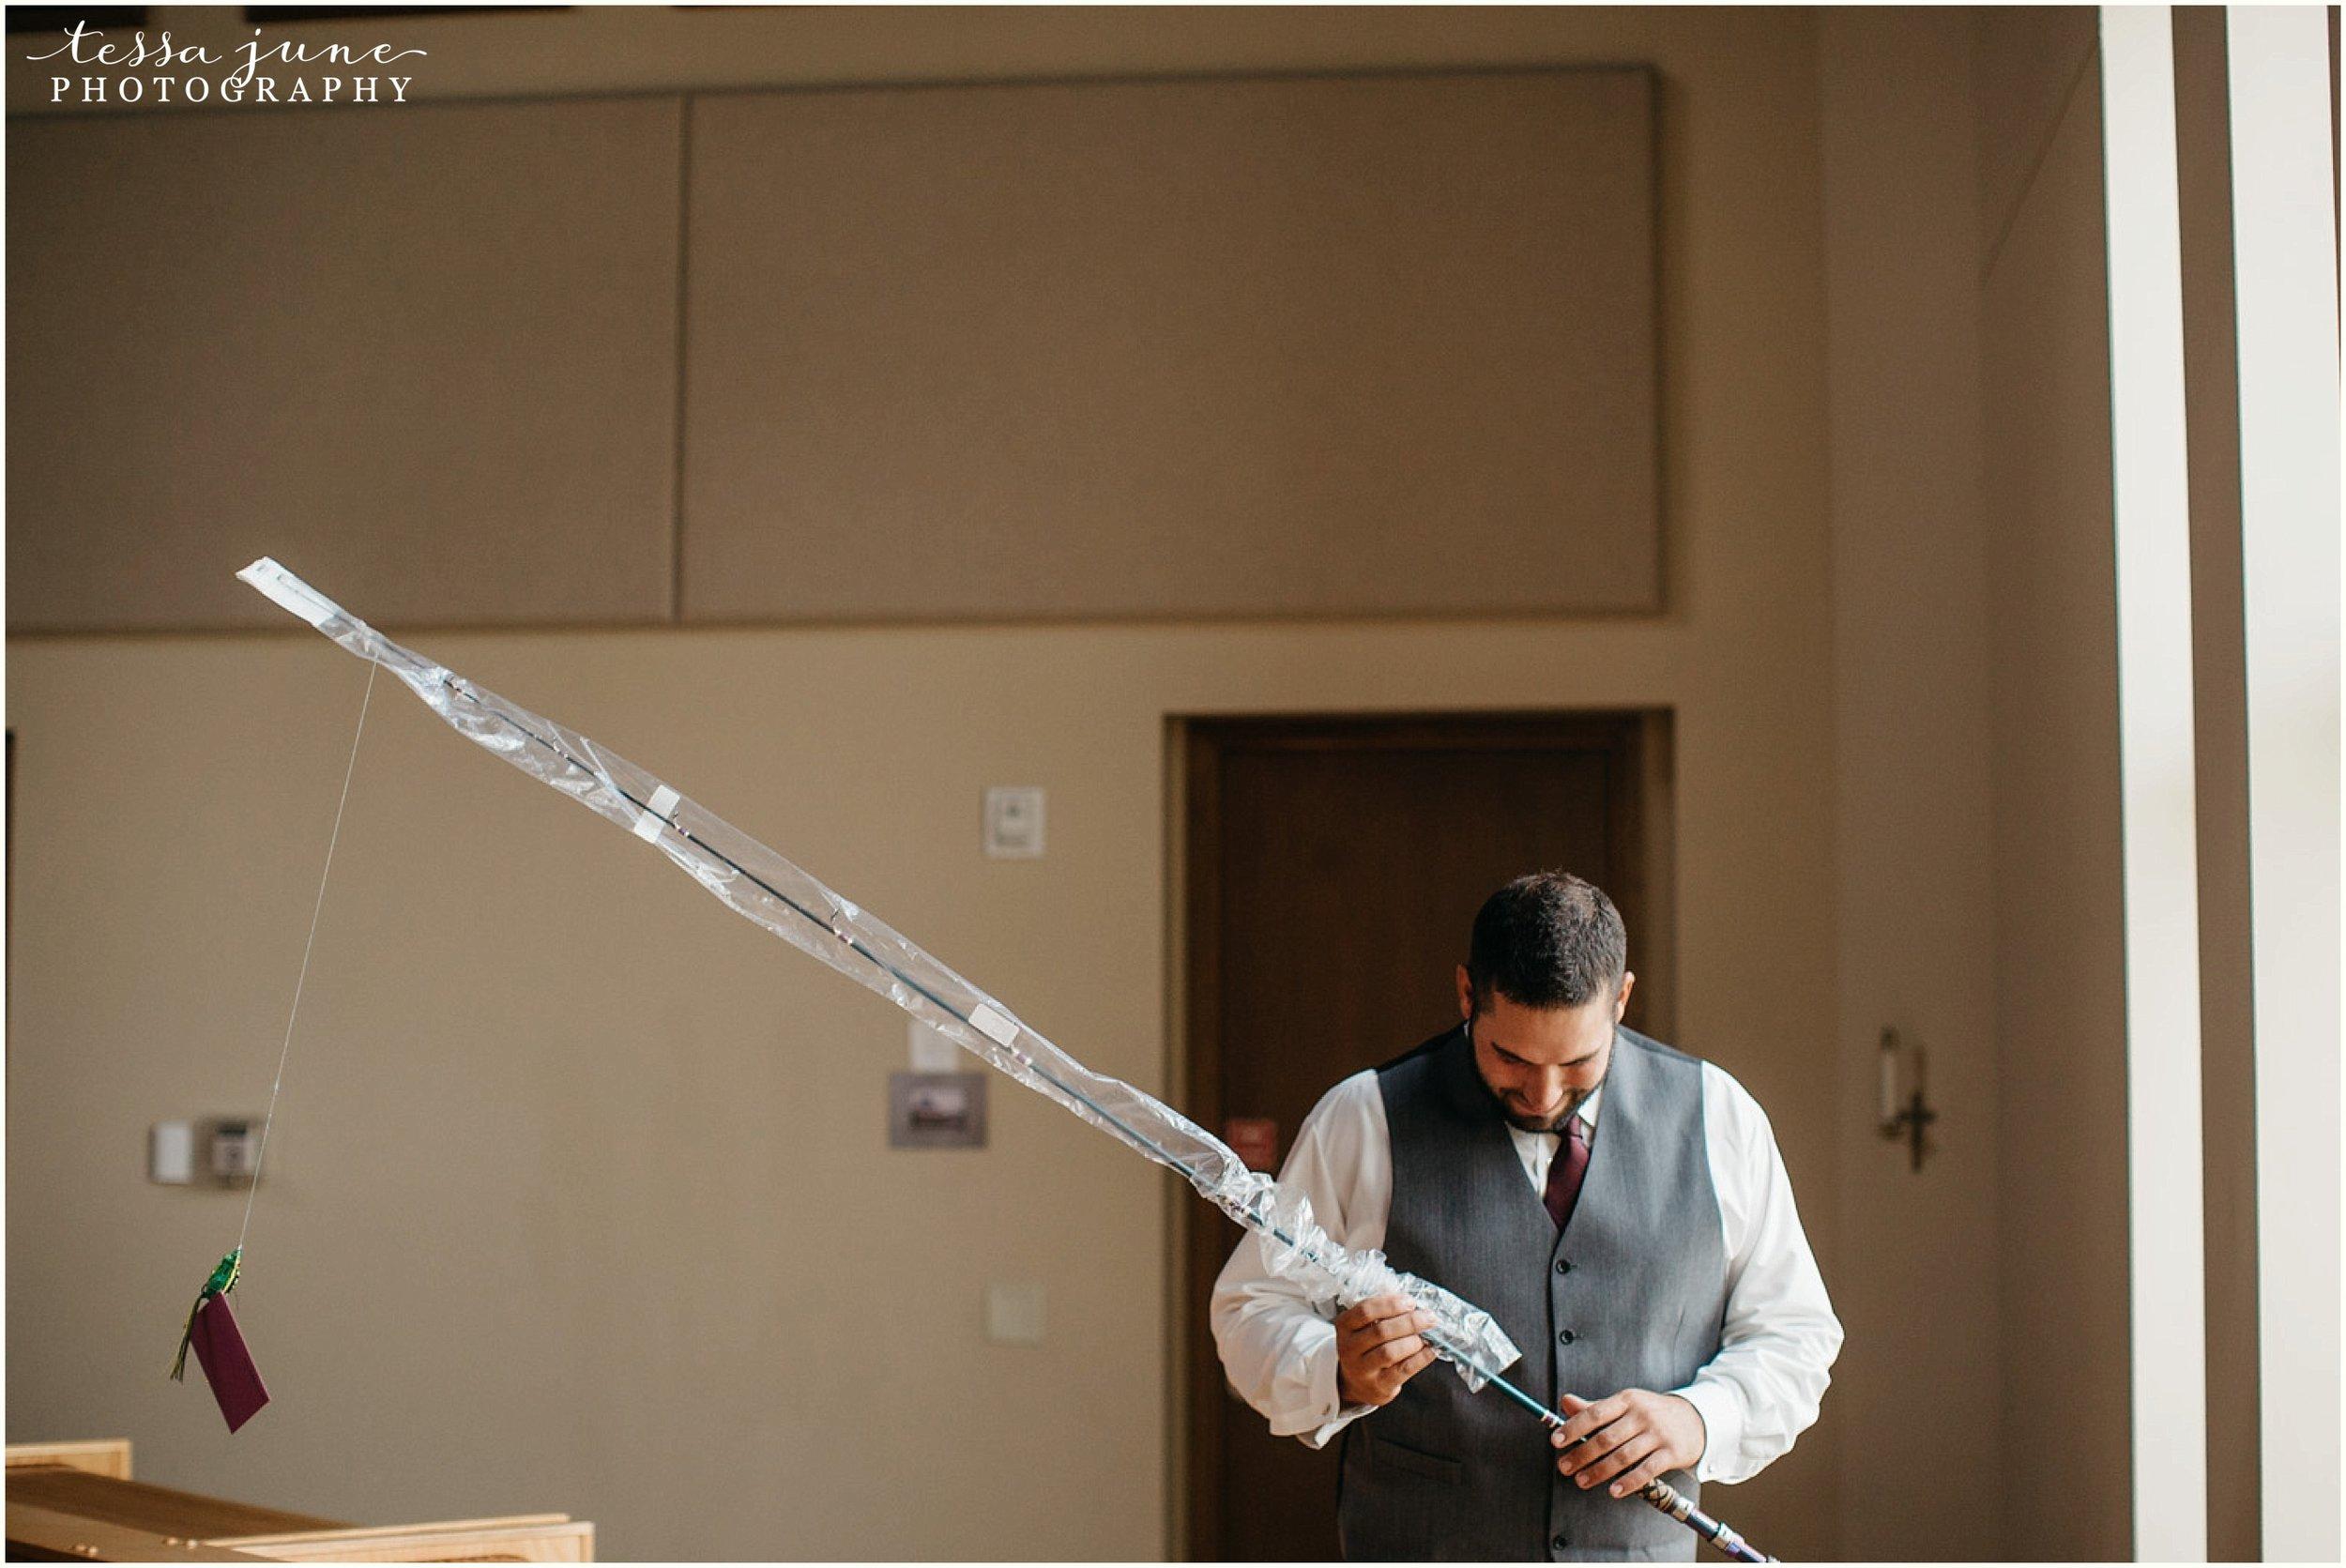 bohemian-minnesota-wedding-mismatched-bridesmaid-dresses-waterfall-st-cloud-tessa-june-photography-15.jpg